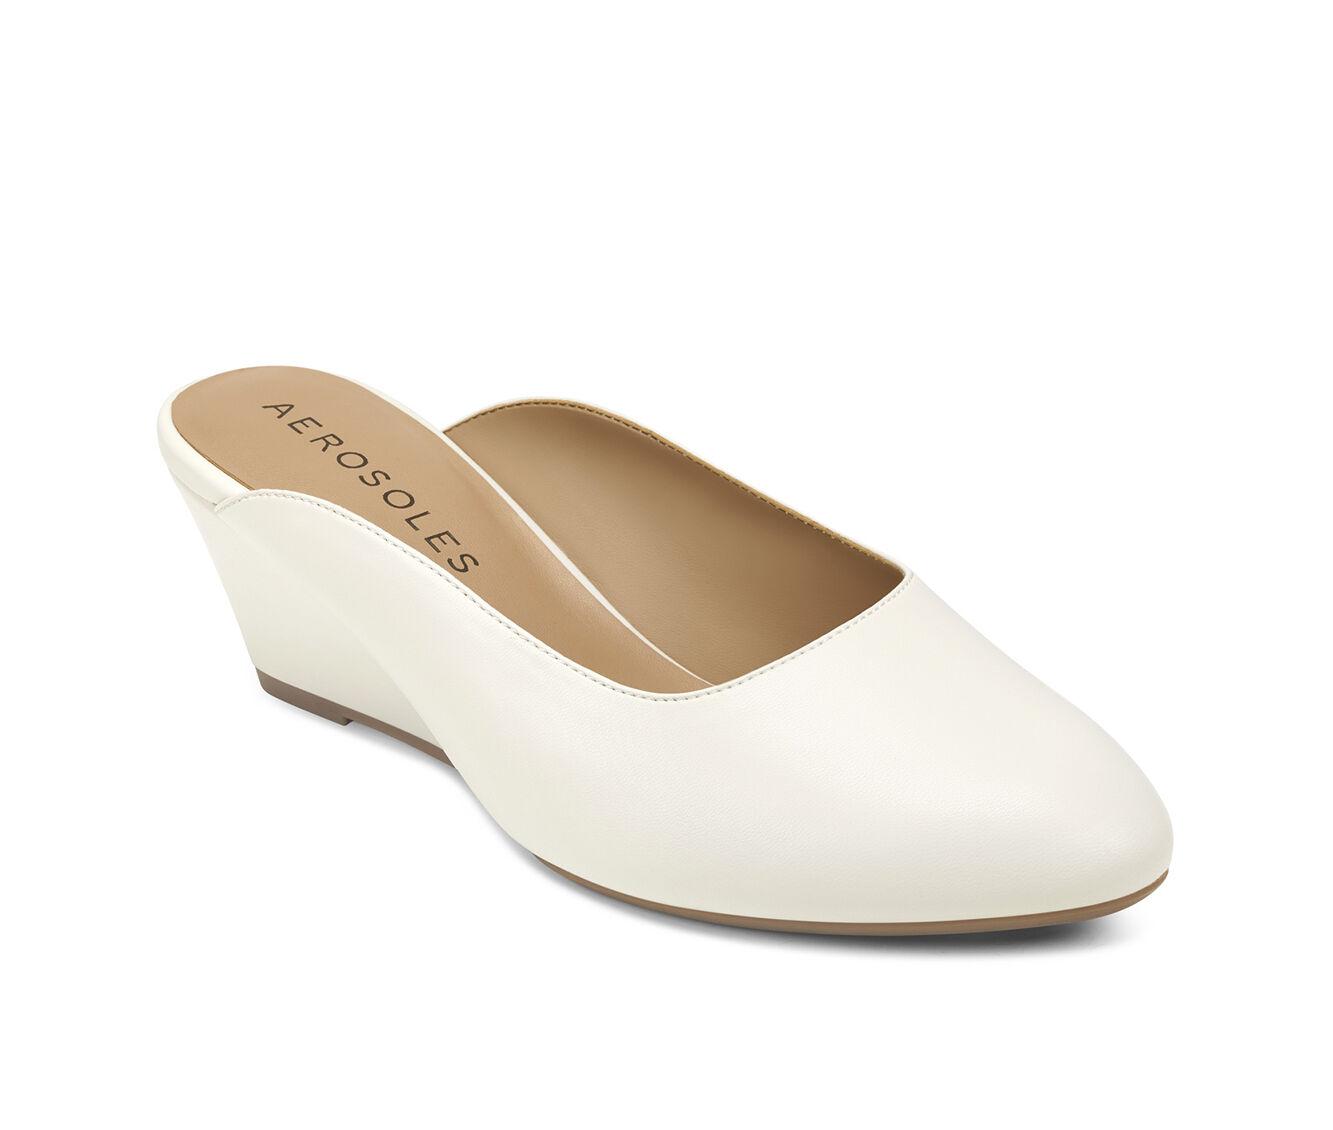 Women's Aerosoles Encircle Mule Heels   Women's shoes   2020 New p7xGm